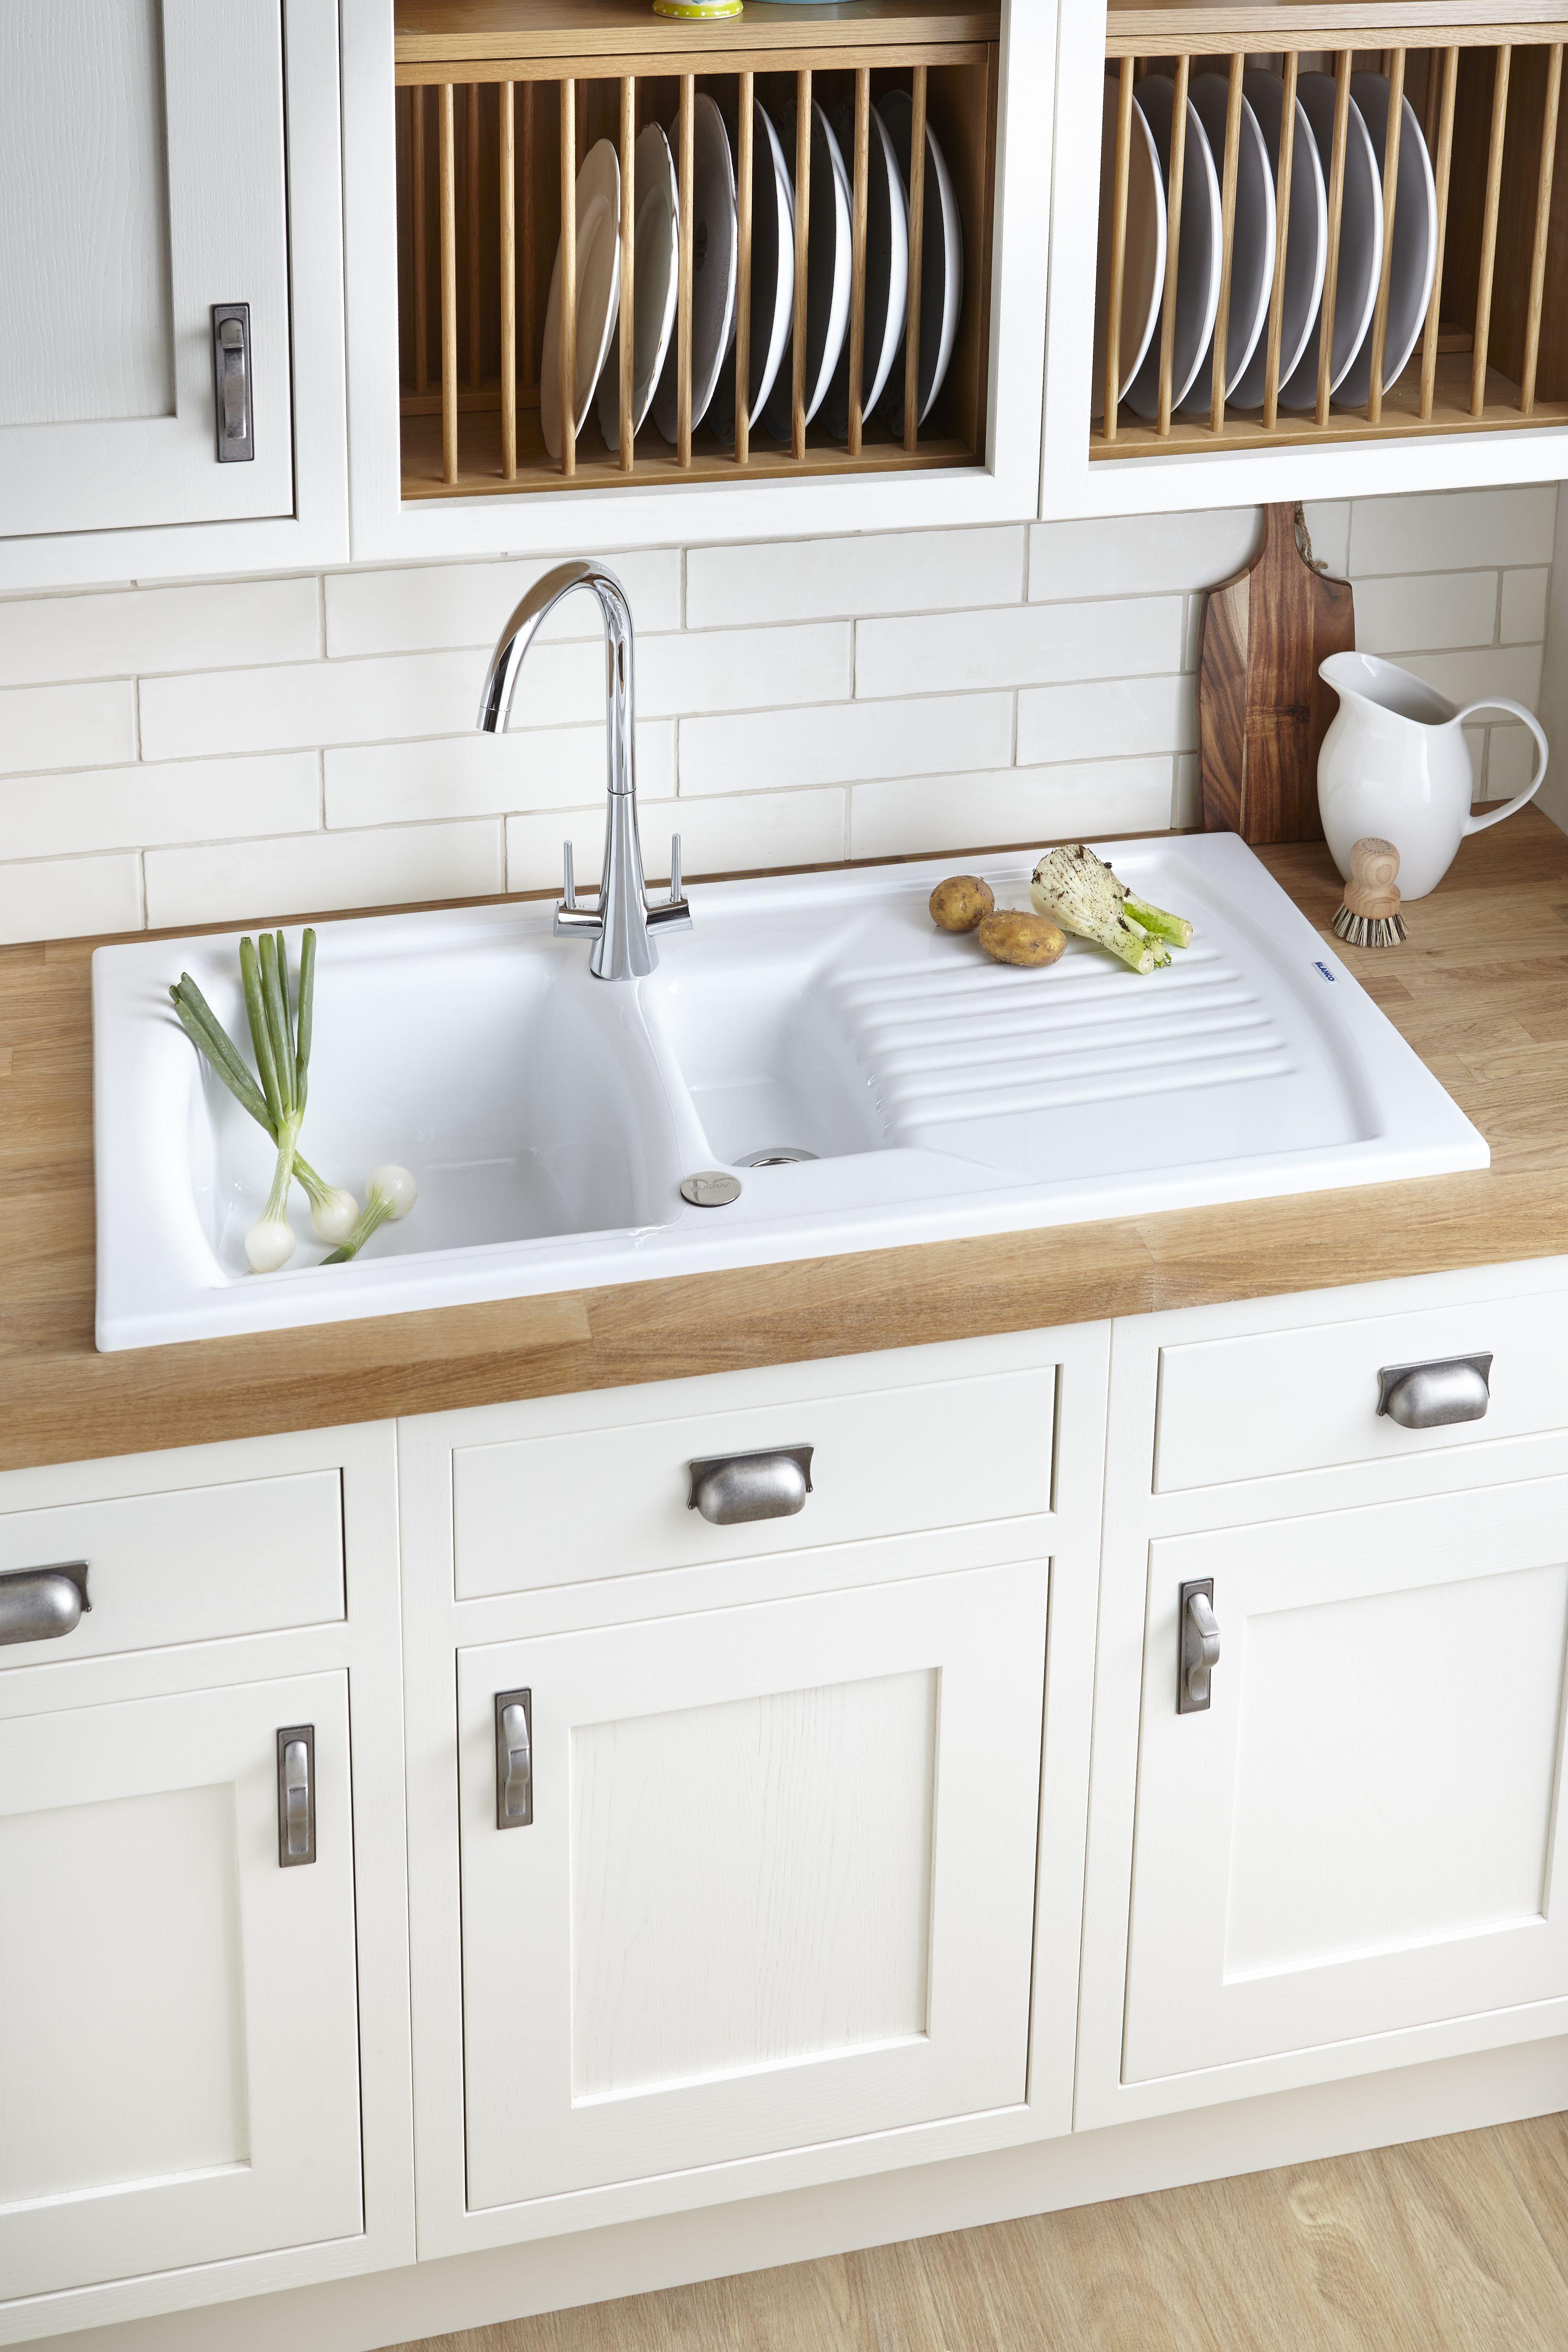 Buyeru0027s Guide To Kitchen Sinks